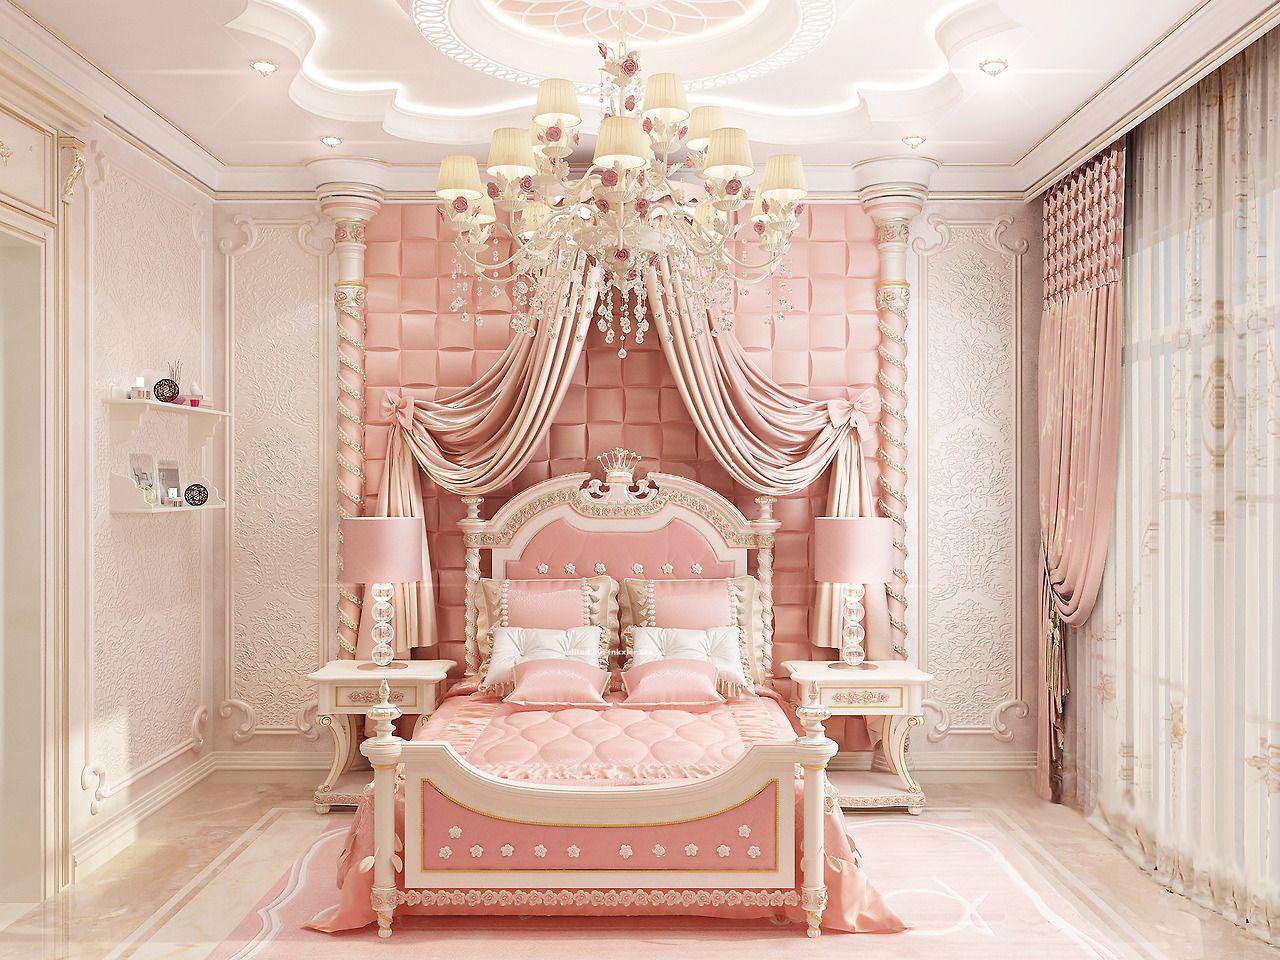 Sapere Aude Touch Of Pink Luxury Antonovich Design Princess Bedroom Set Bedroom Design Girl Bedroom Decor